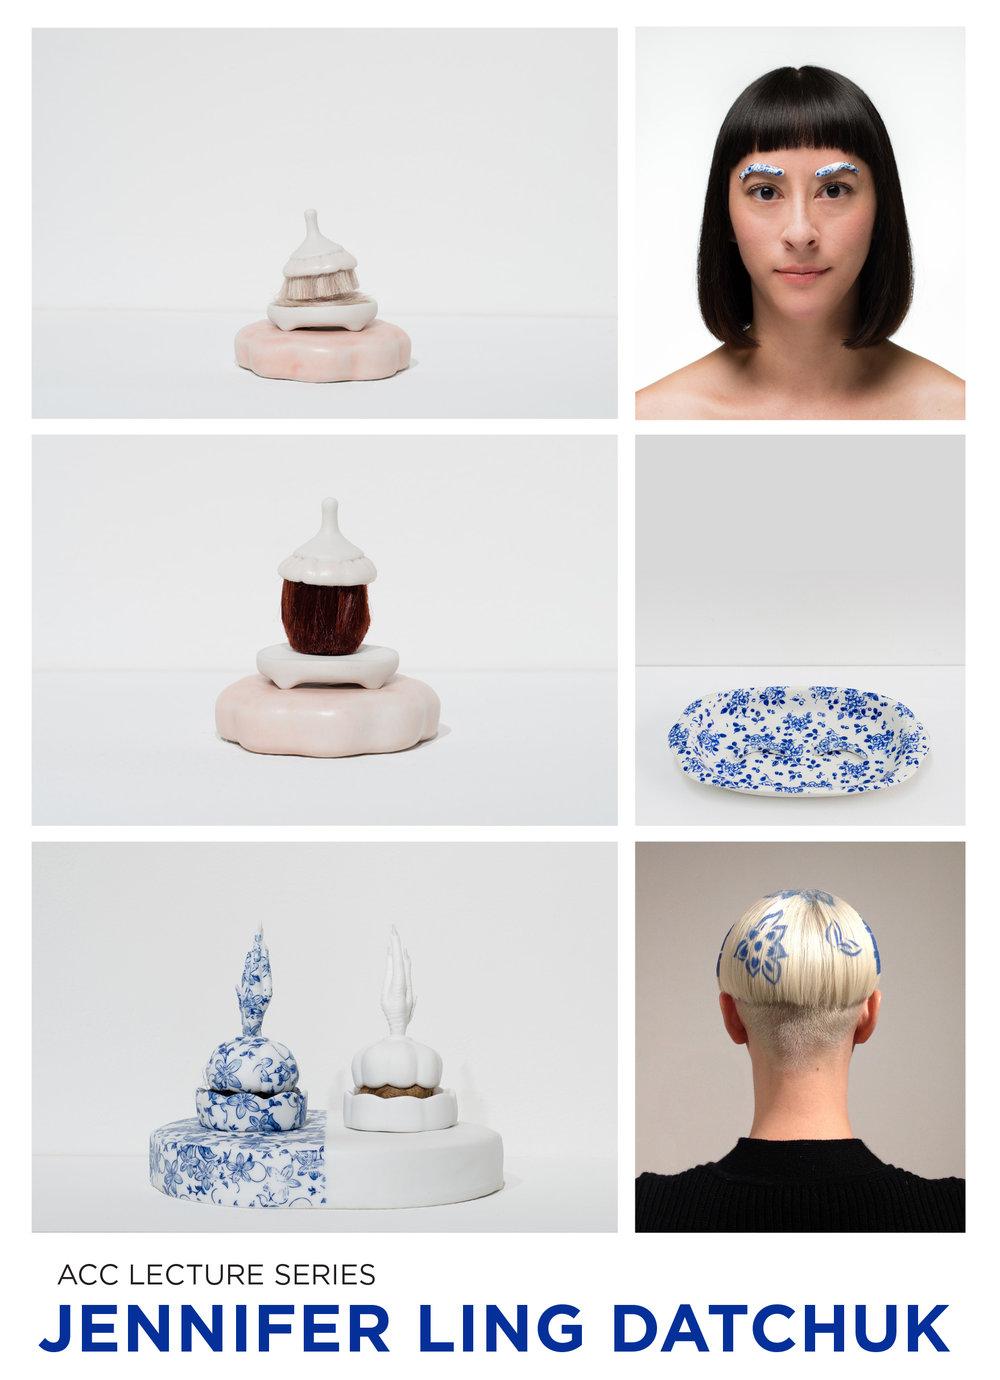 Jennifer-Ling-Datchuk.jpg